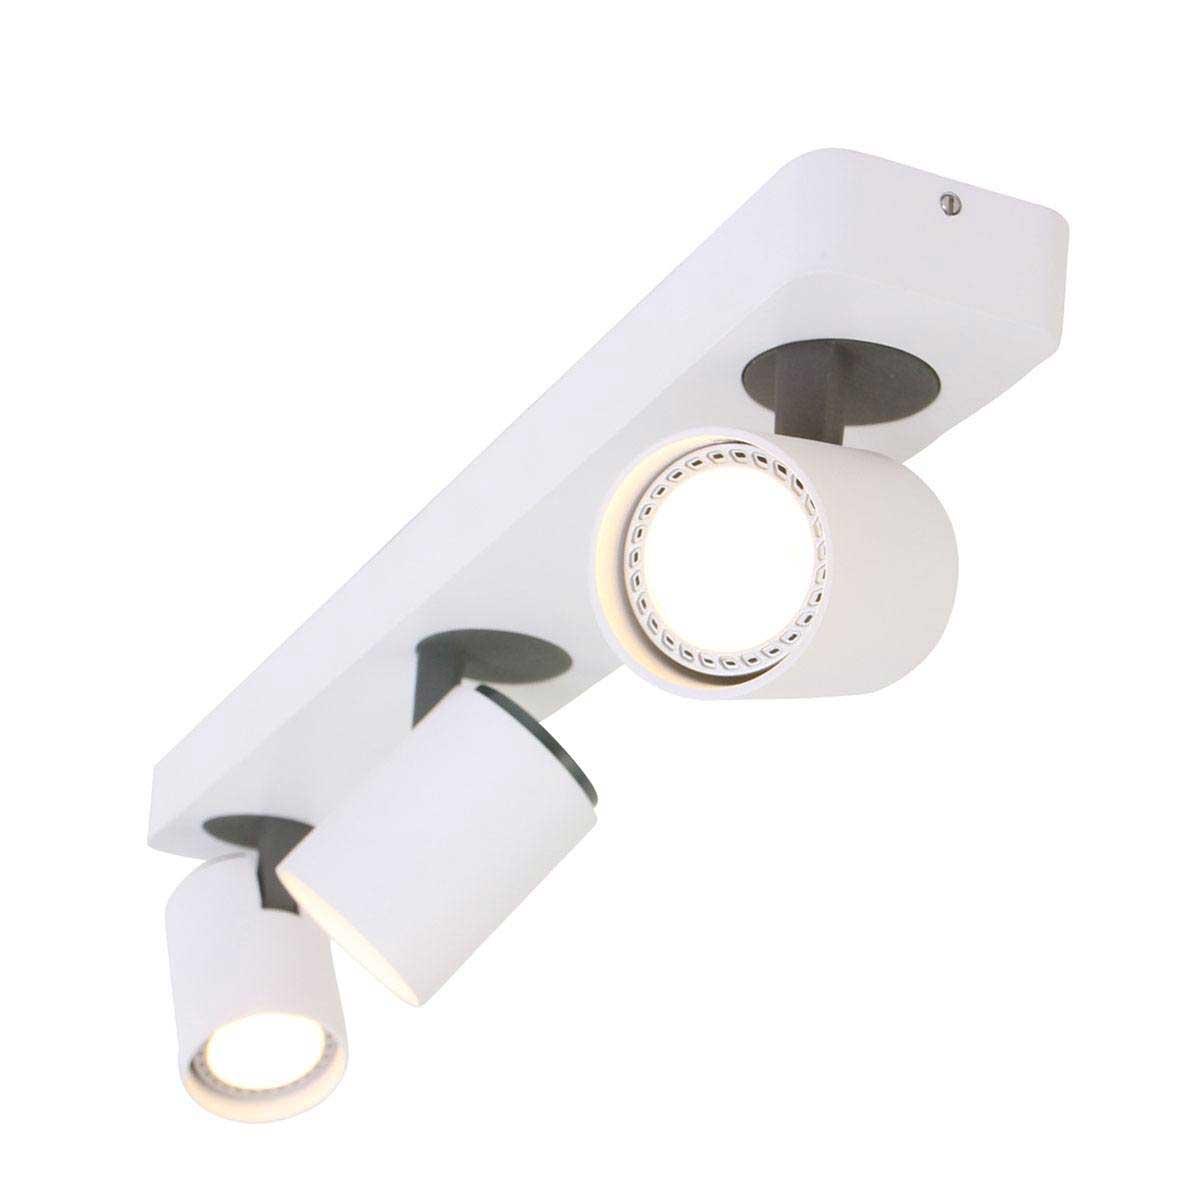 Spot 3-lichts gu10 MEXLITE - 1361W - Plafondlamp- Spots- Mexlite- Mexlite- Modern - Design- Wit Zwart - Metaal